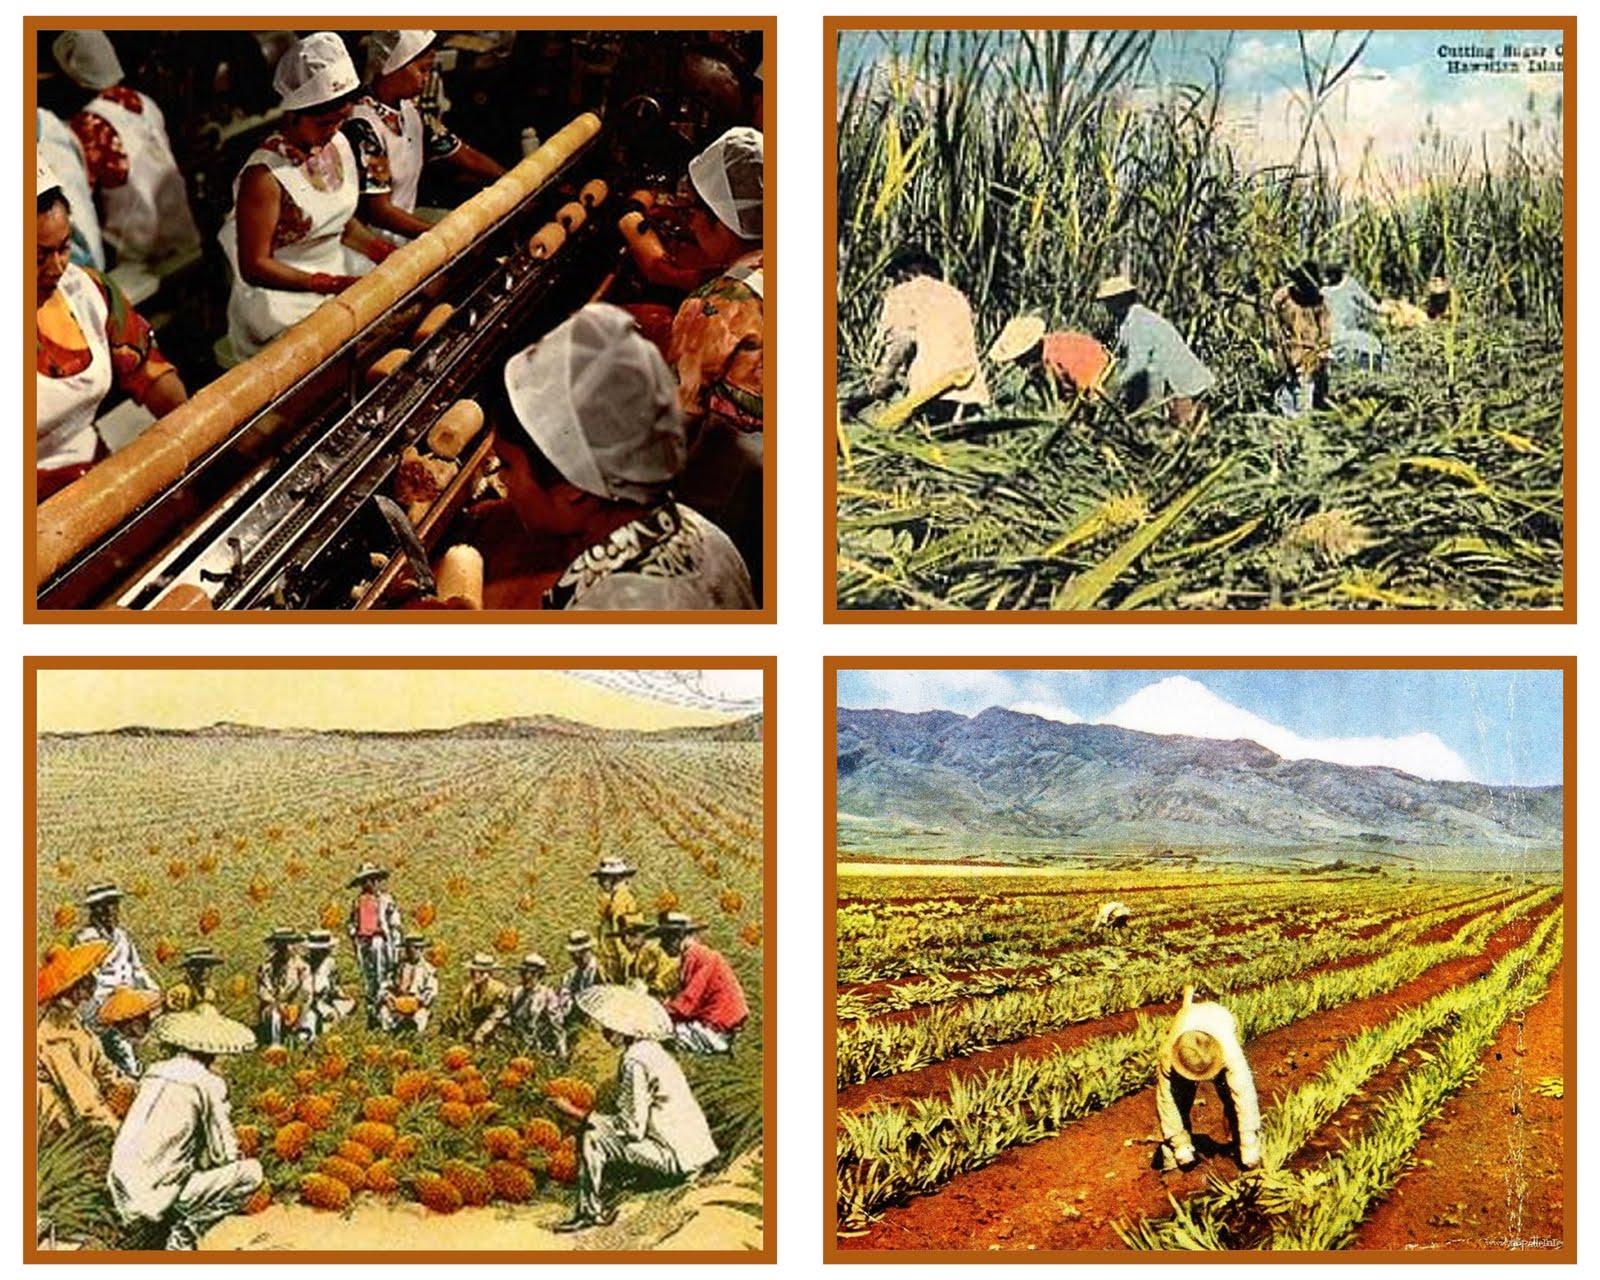 http://3.bp.blogspot.com/-zh7FodWbbI4/TXO_VHN5NjI/AAAAAAAAEec/oJ1e93PeYts/s1600/Plantation%2Bworkers1.jpg